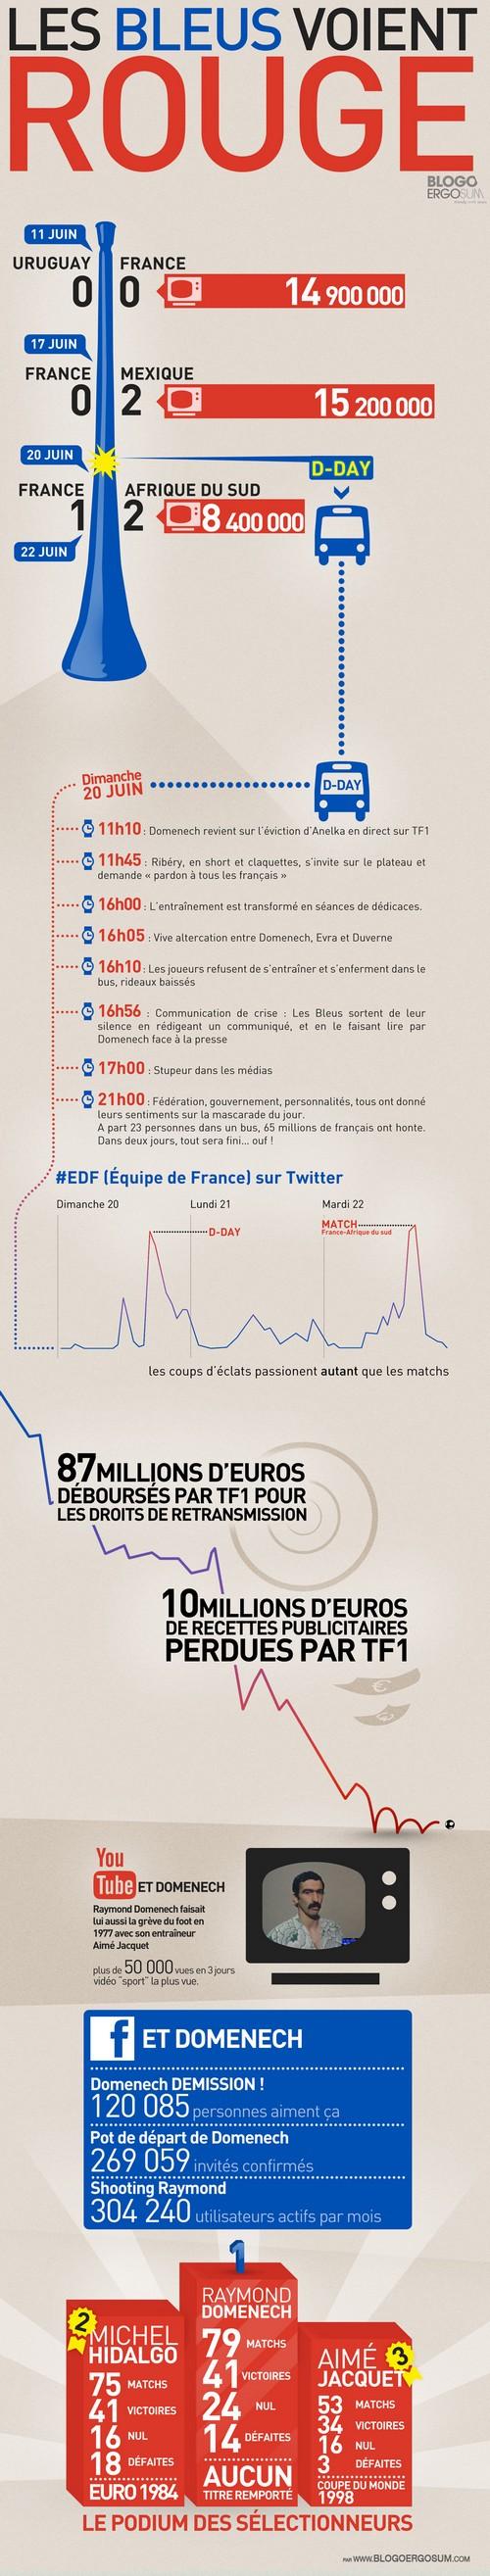 infographie equipe de france